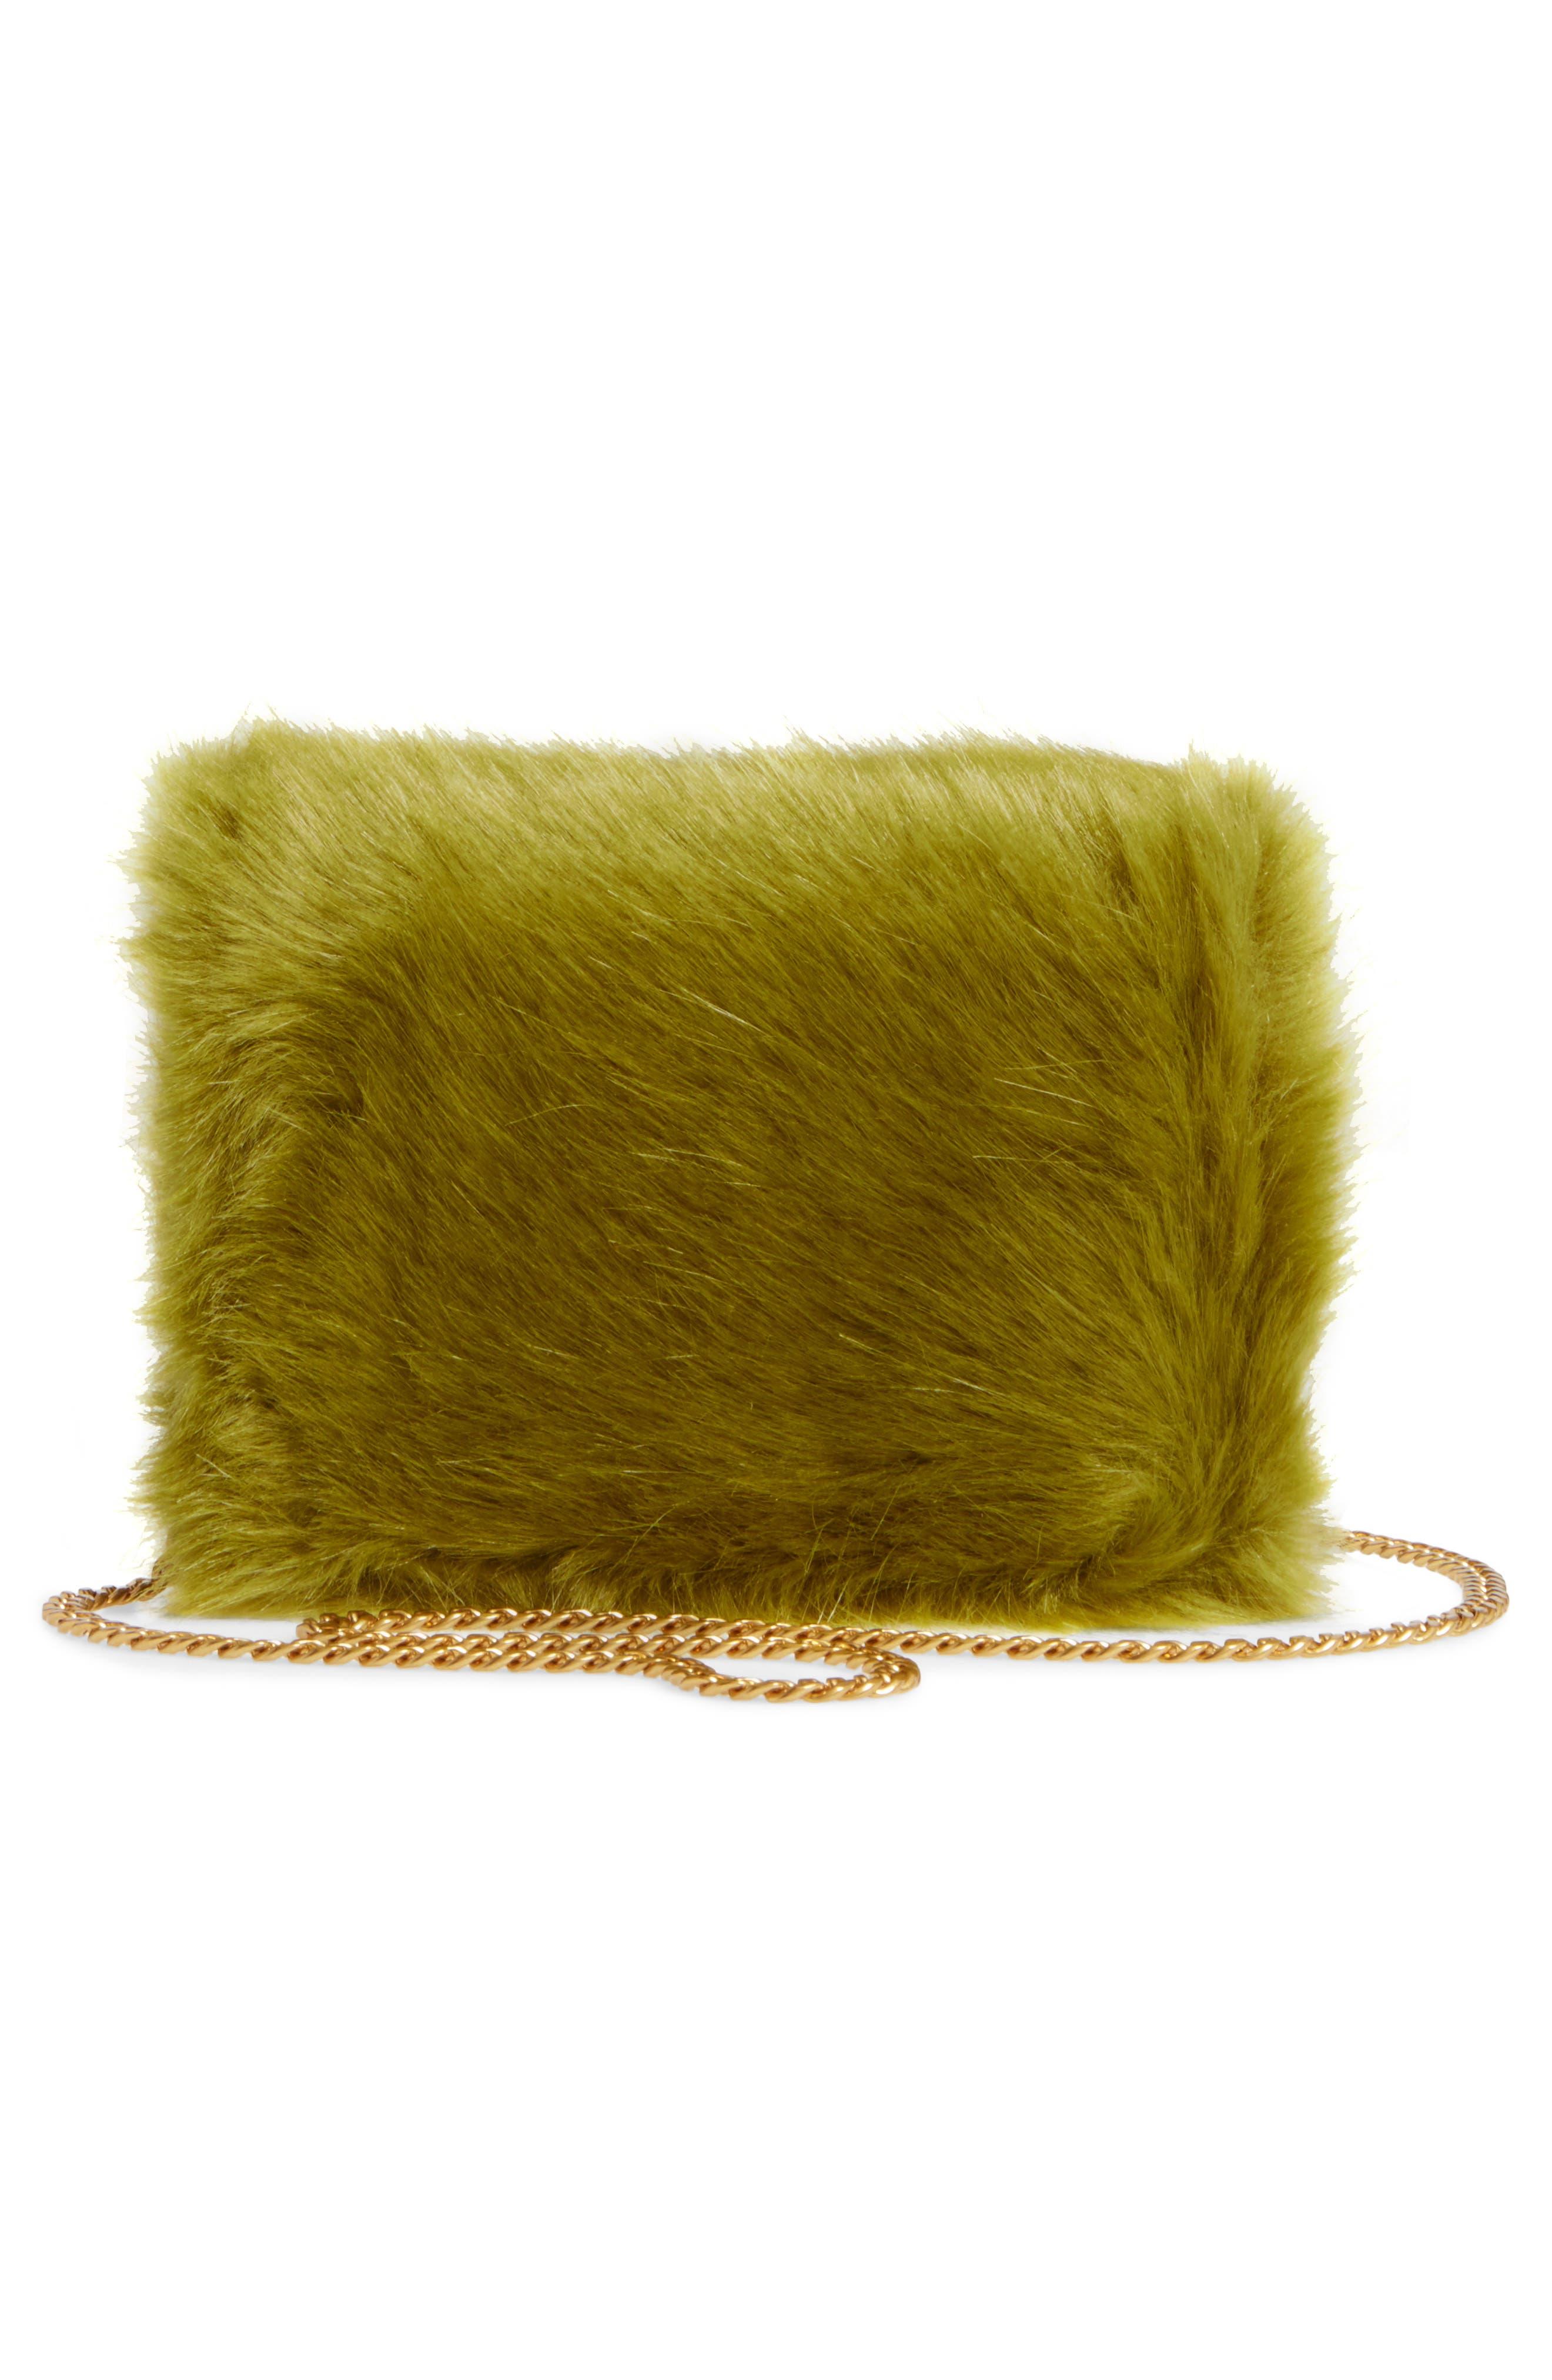 Mini Chelsea Faux Fur Convertible Crossbody Bag,                             Alternate thumbnail 3, color,                             320